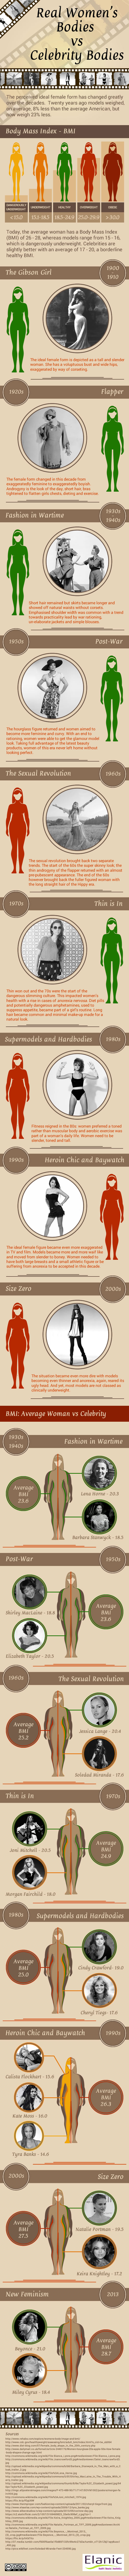 Real Women's Bodies Vs Celebrity Bodies